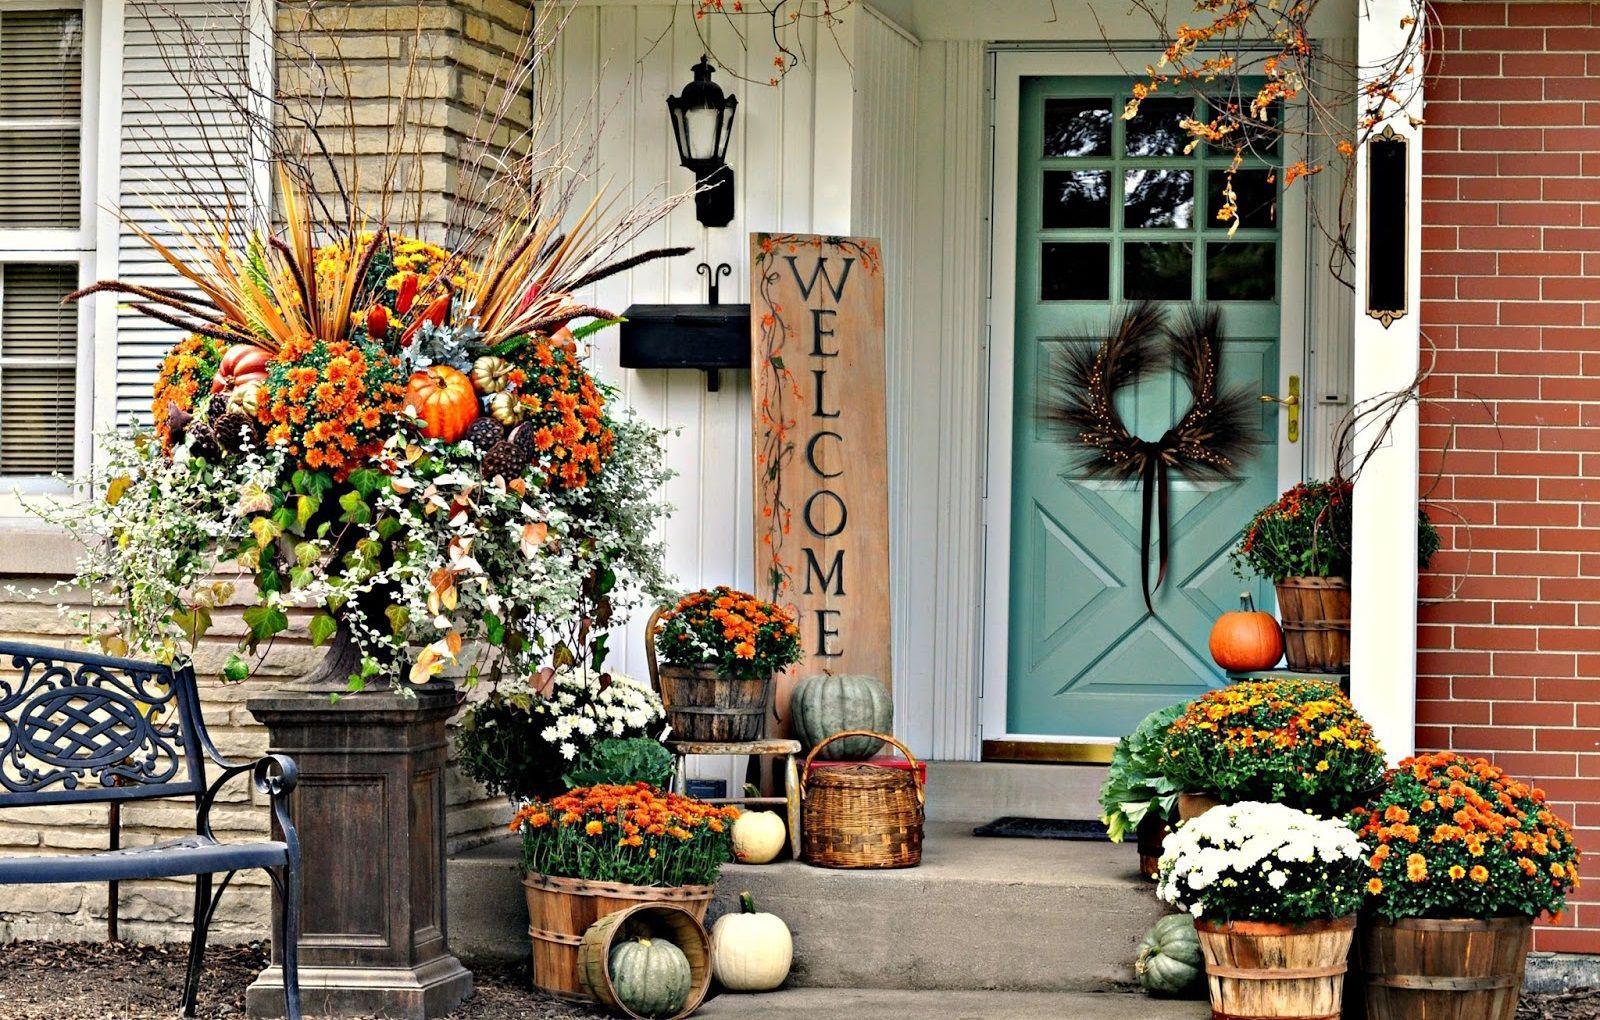 Porta d'ingresso in autunno